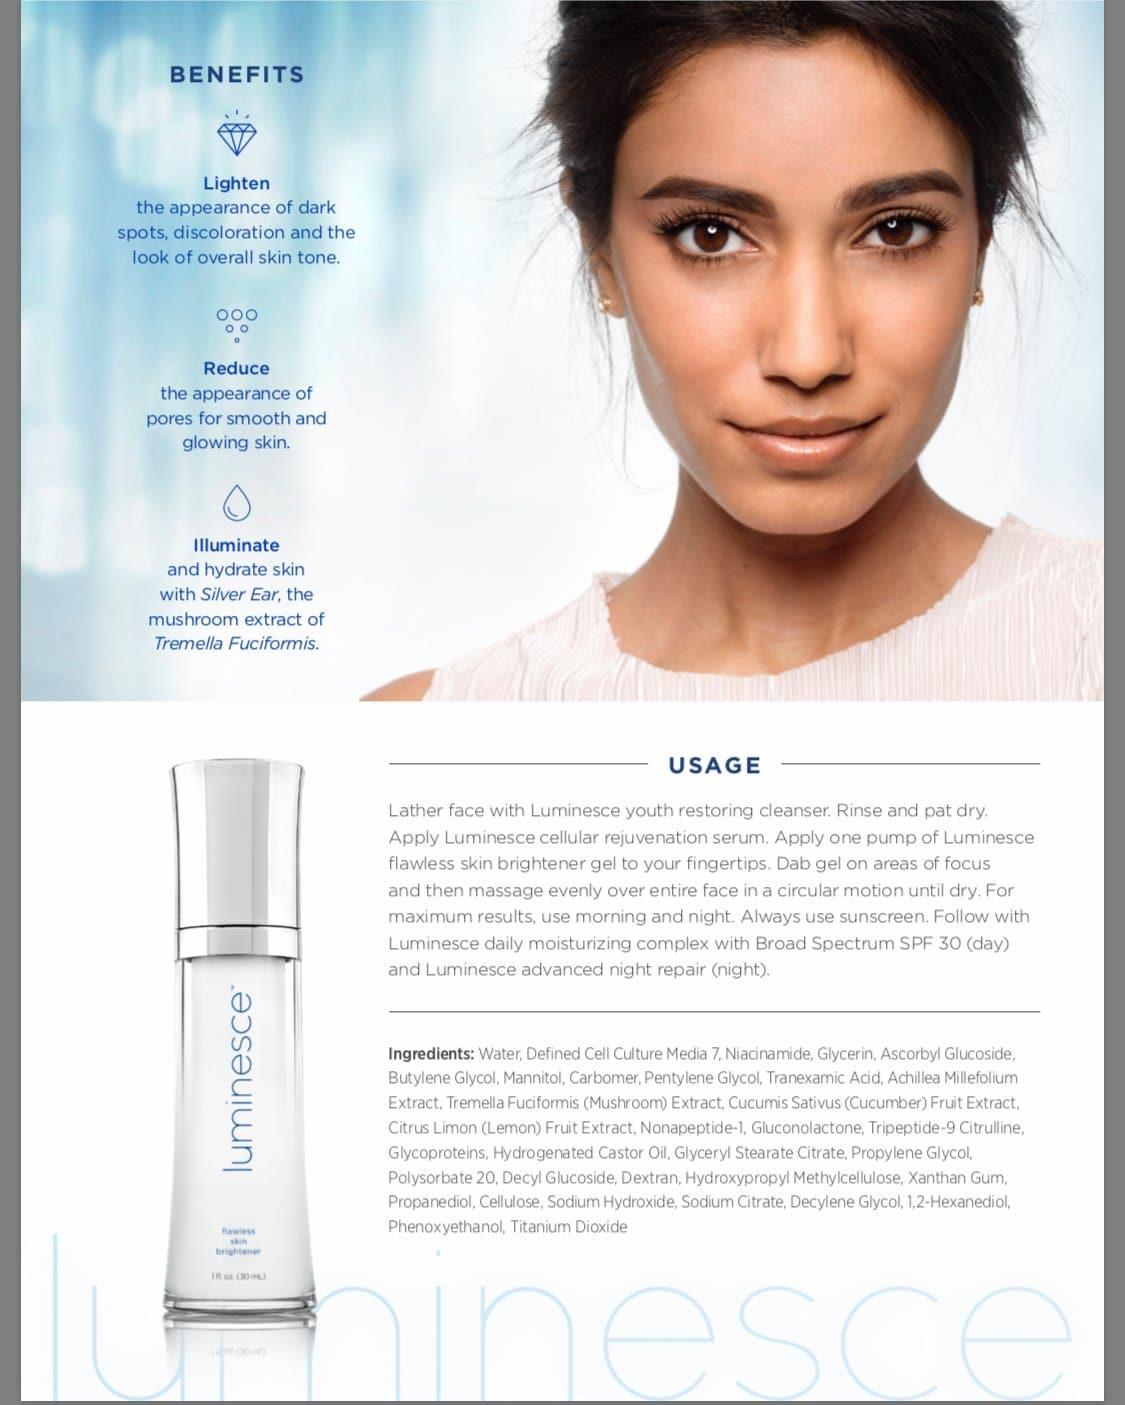 Luminesce Flawless Skin Brightener Ingredients